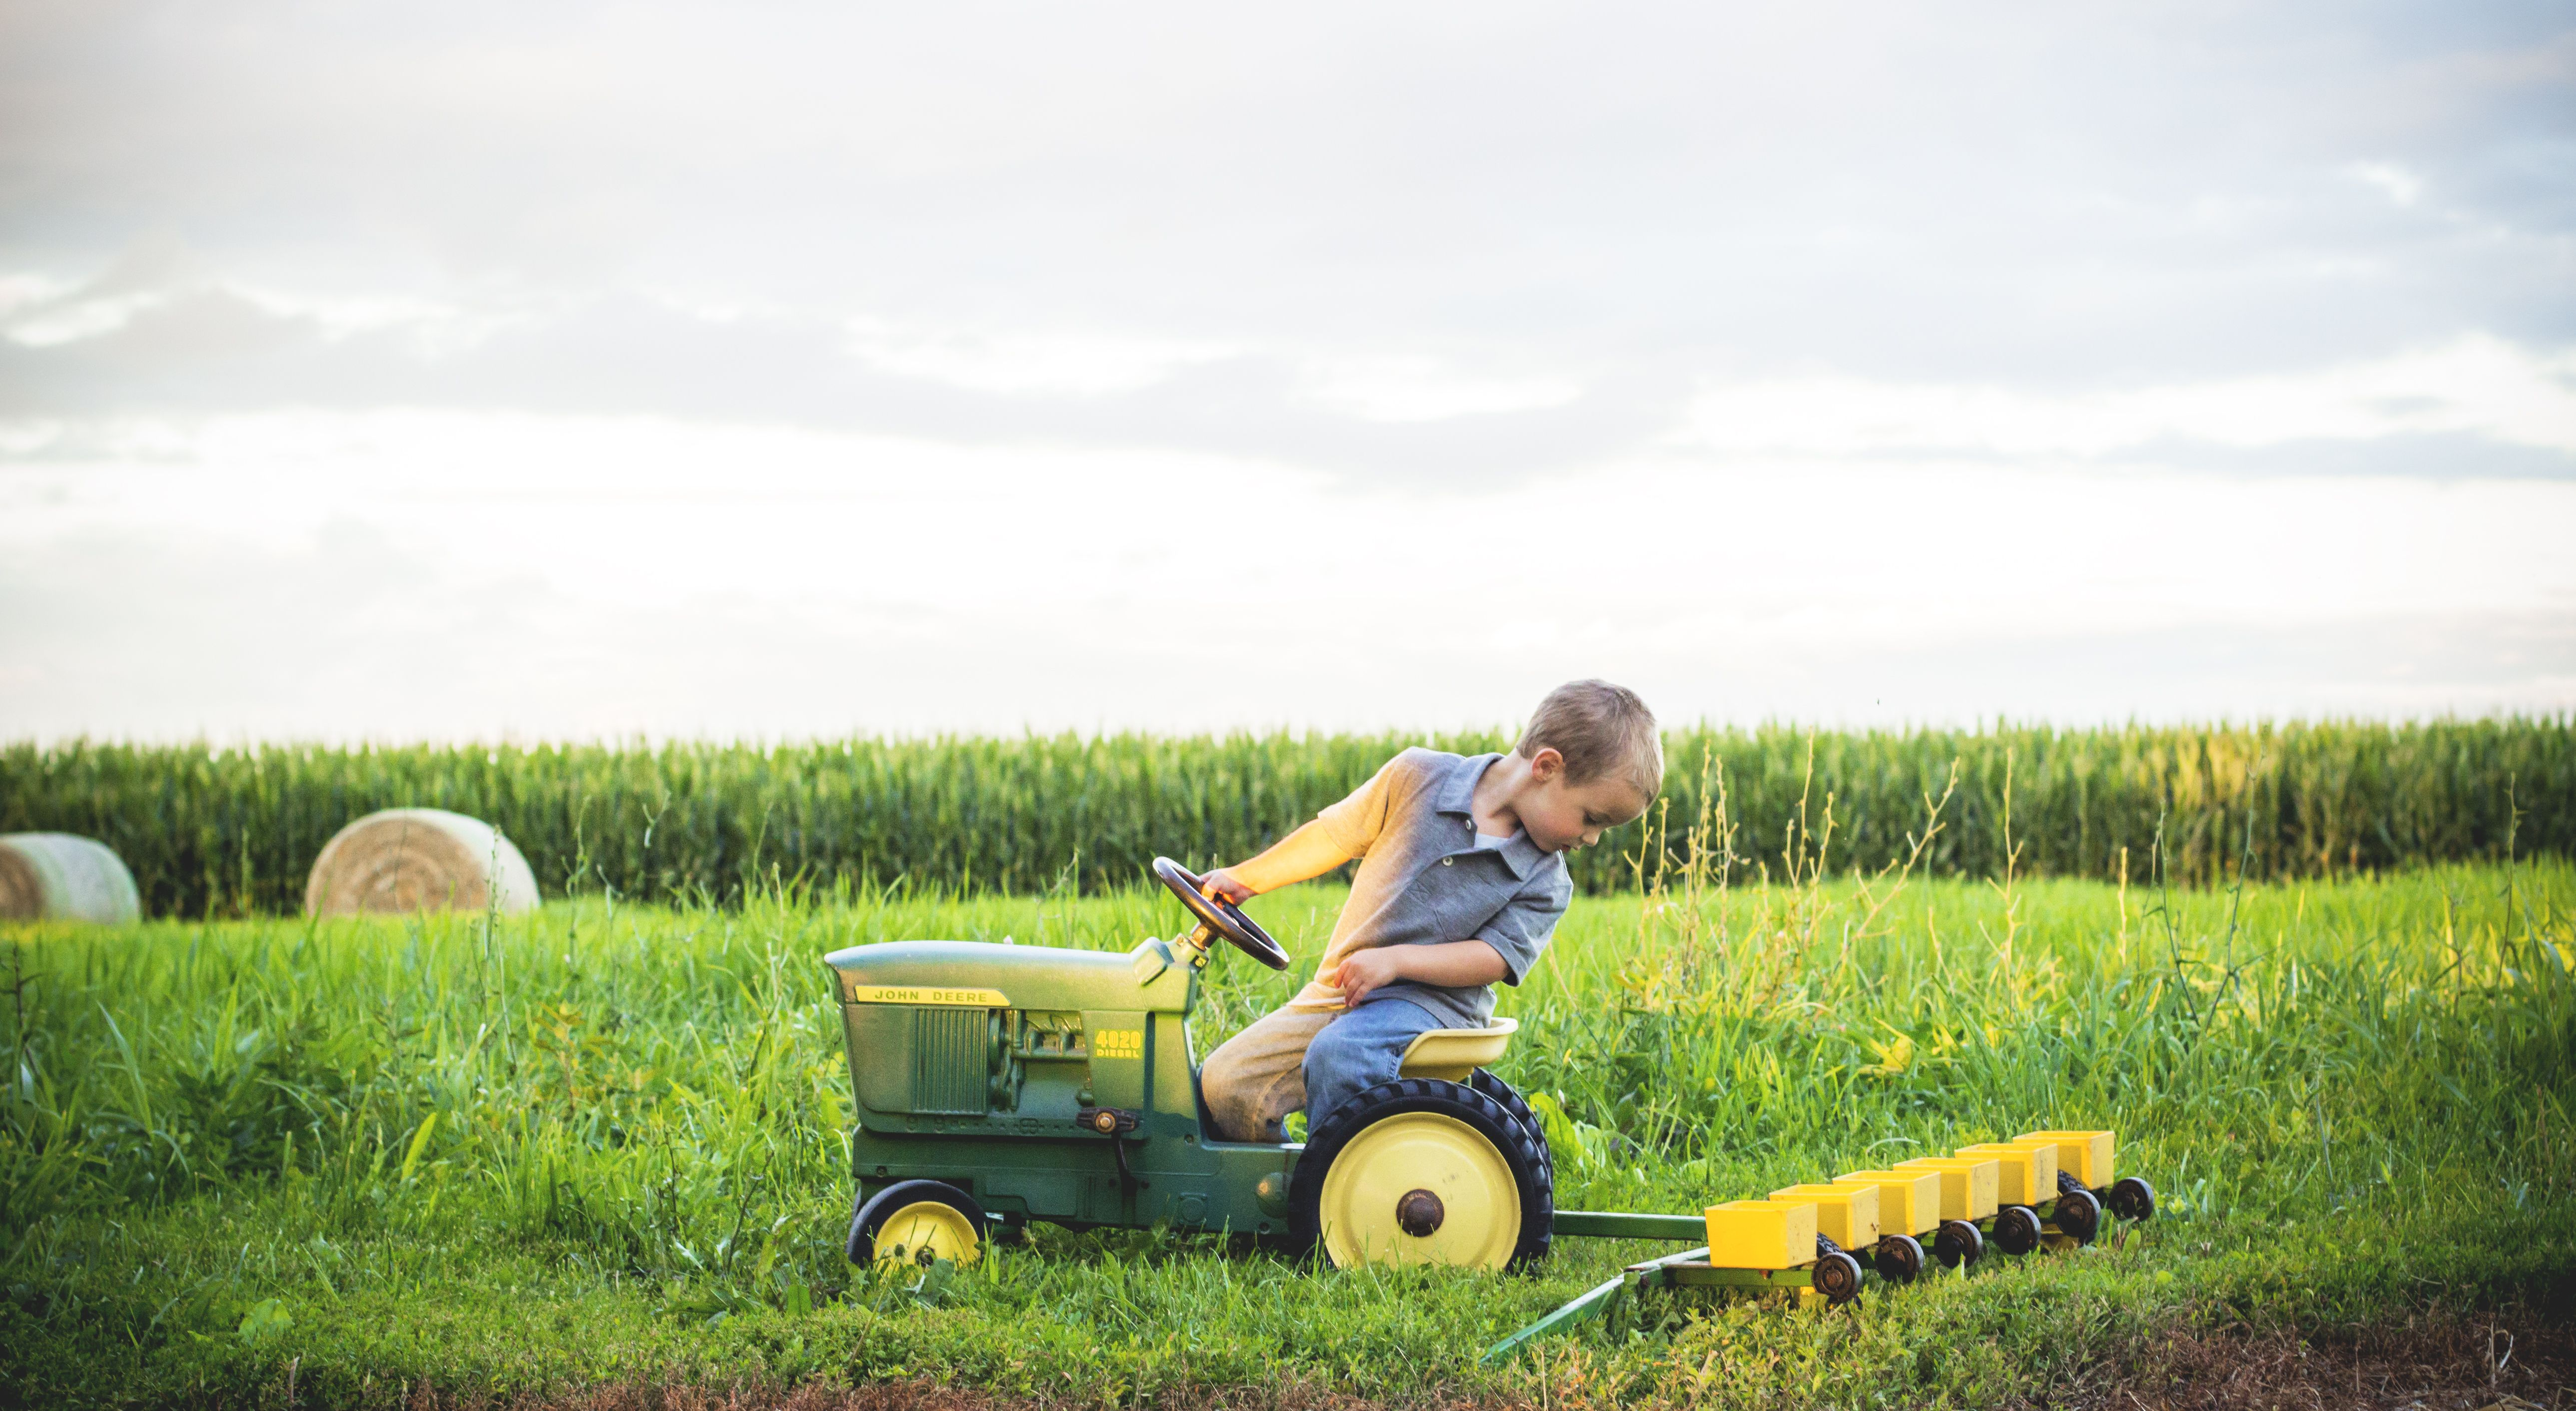 #tractor #photography #johndeere #littleboy